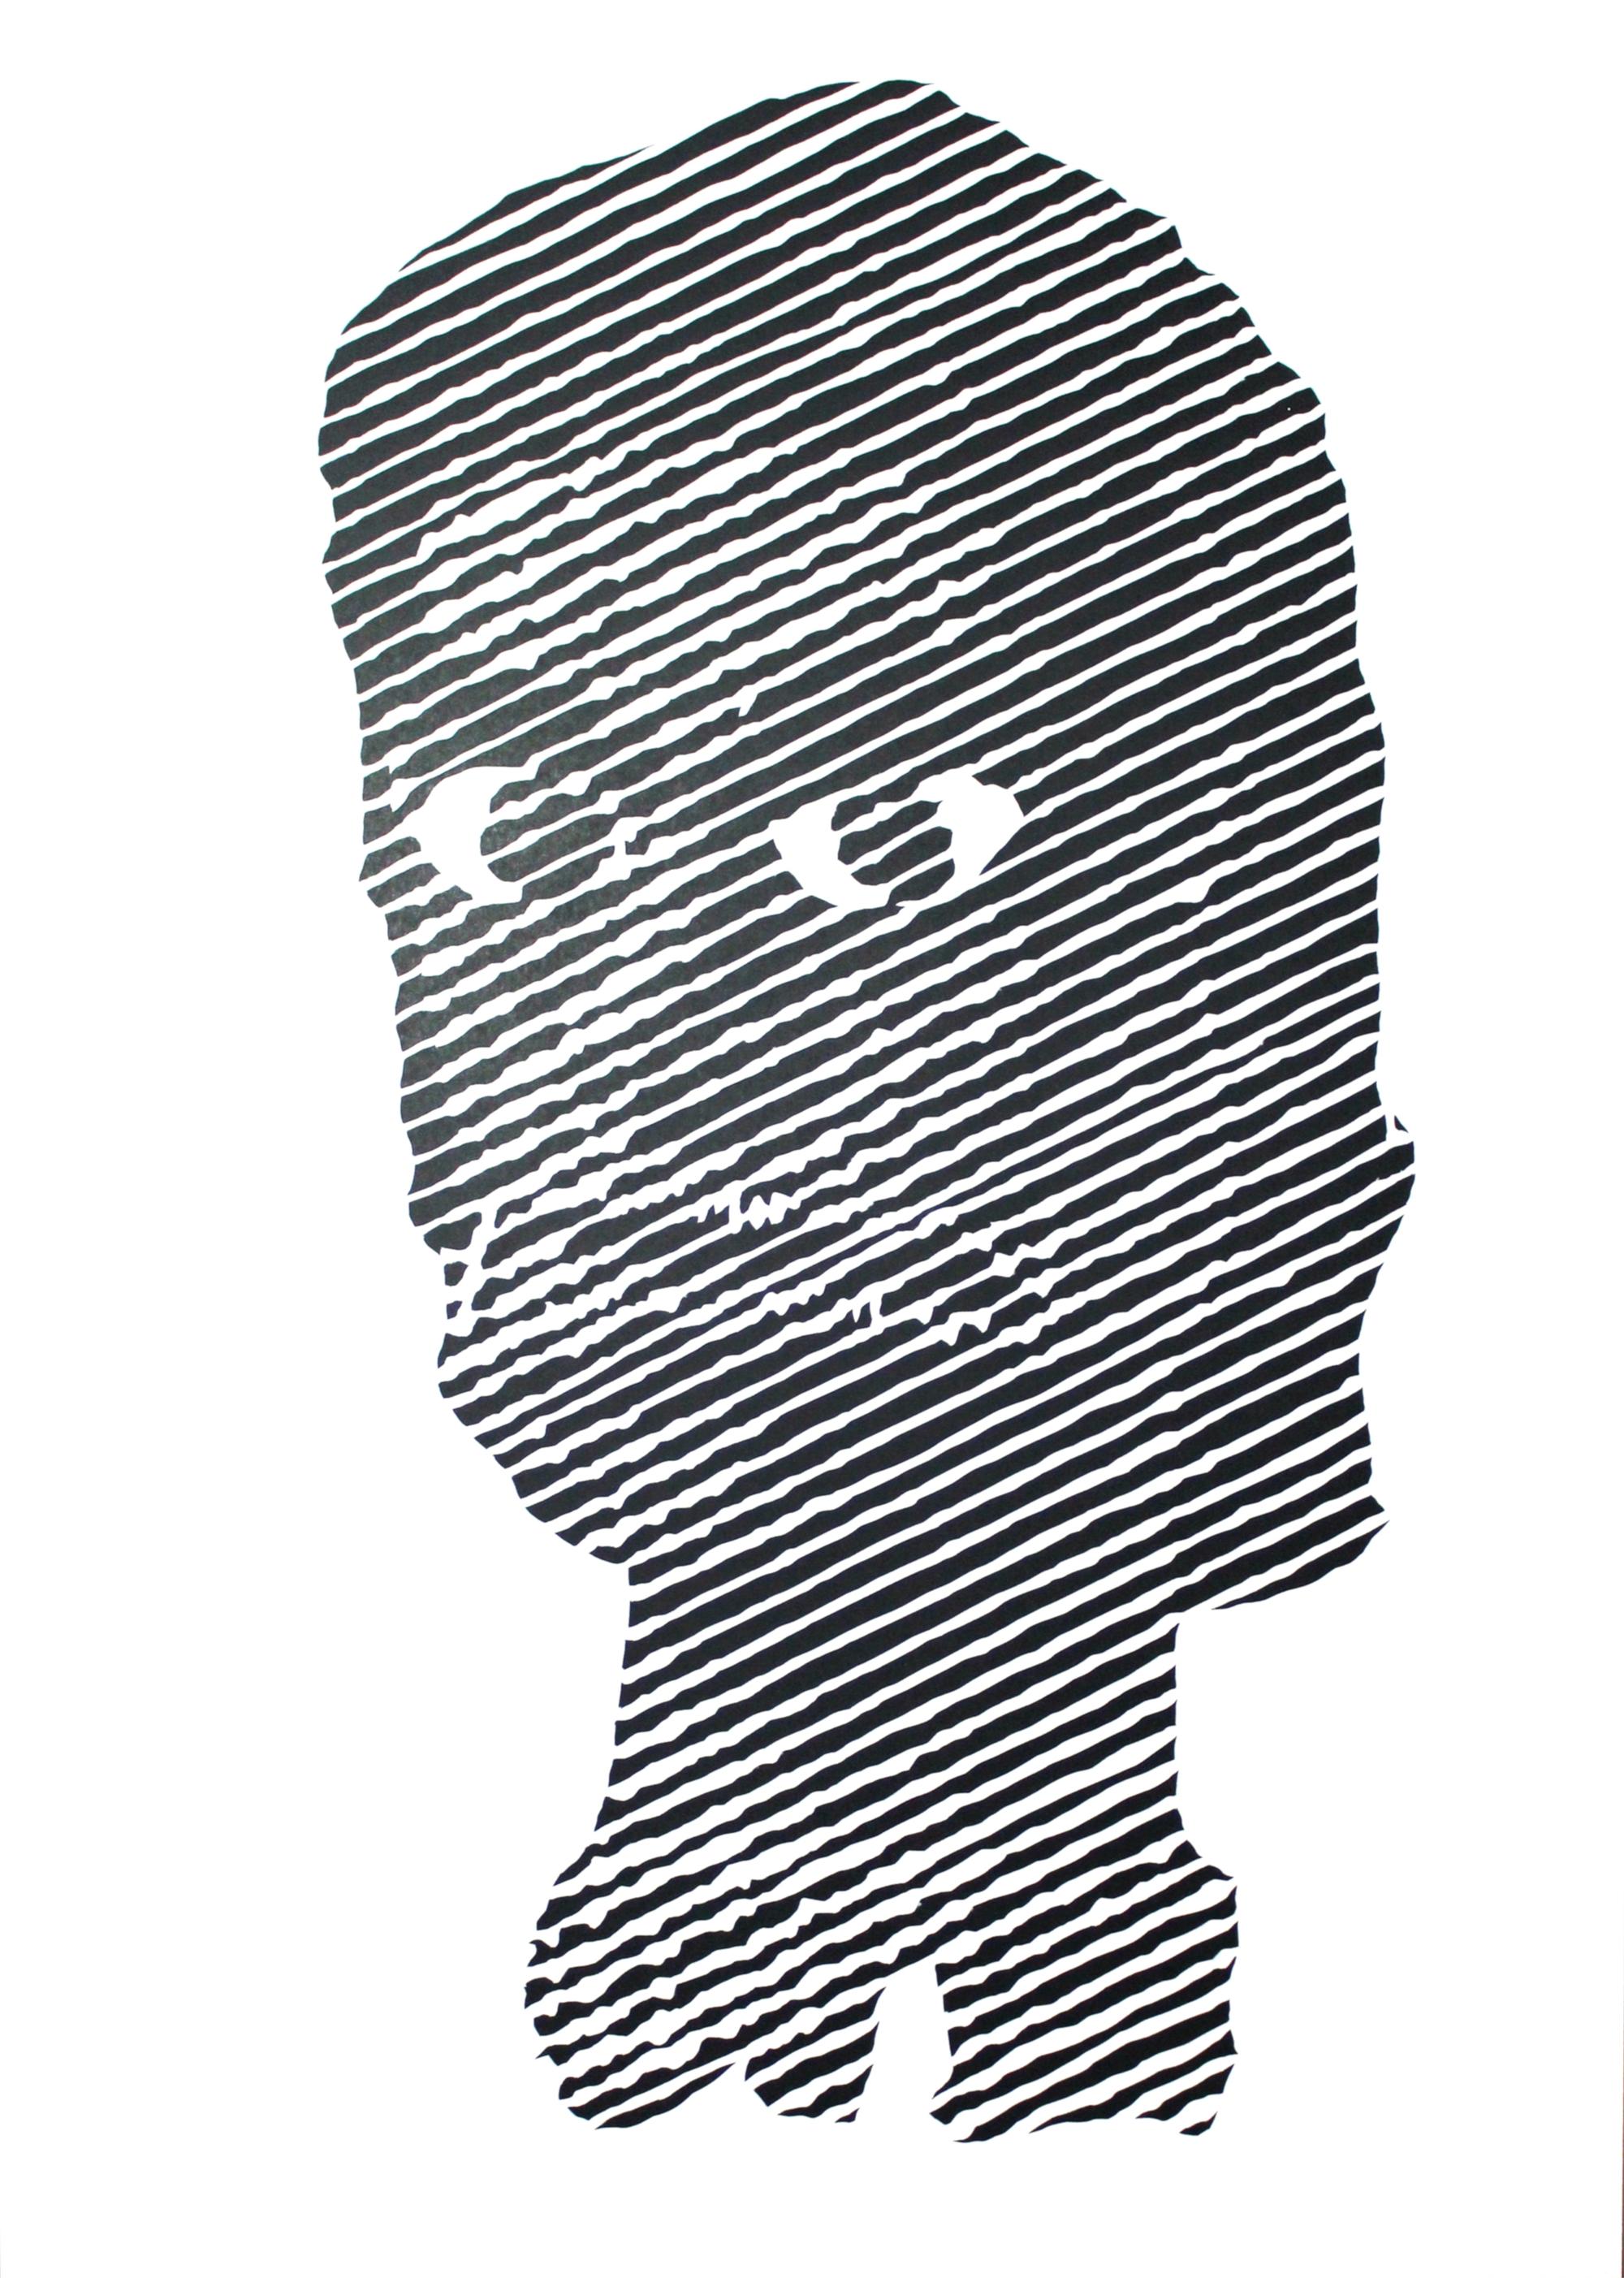 Akua Hulu Manu/Feathered God #5 by Ian Kuali'i